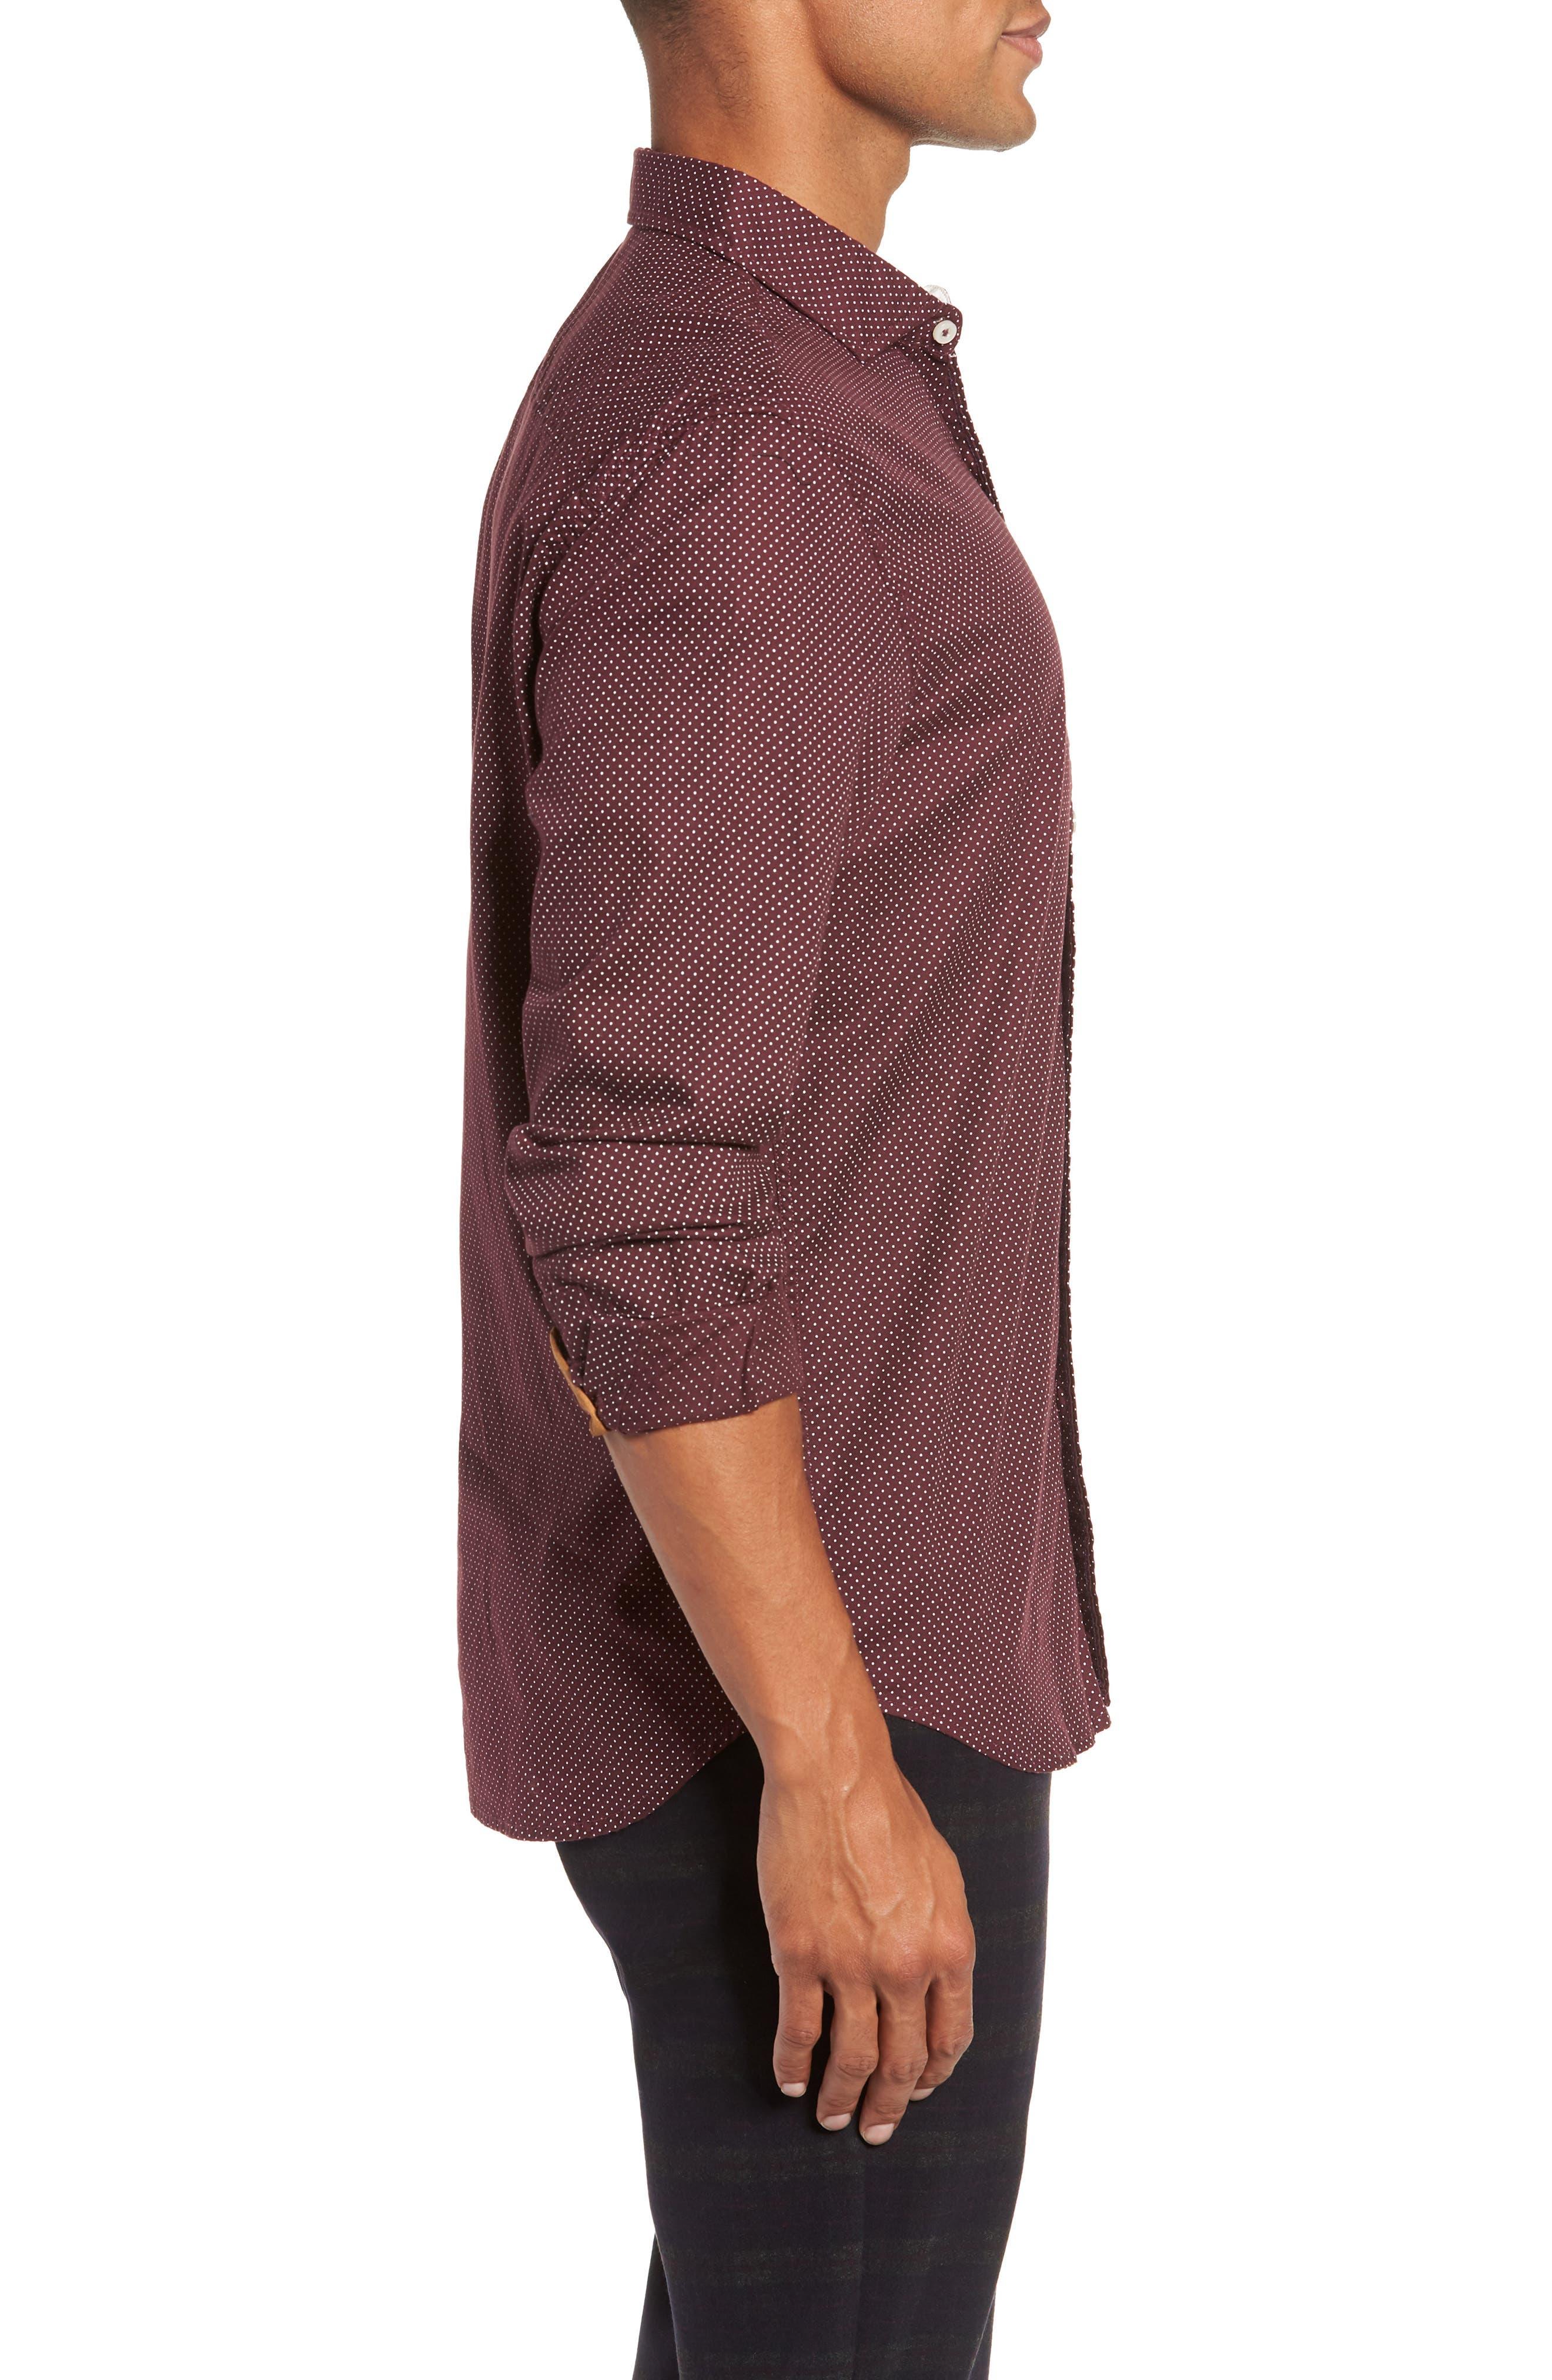 Earnest Regular Fit Dotted Sport Shirt,                             Alternate thumbnail 4, color,                             BURGUNDY